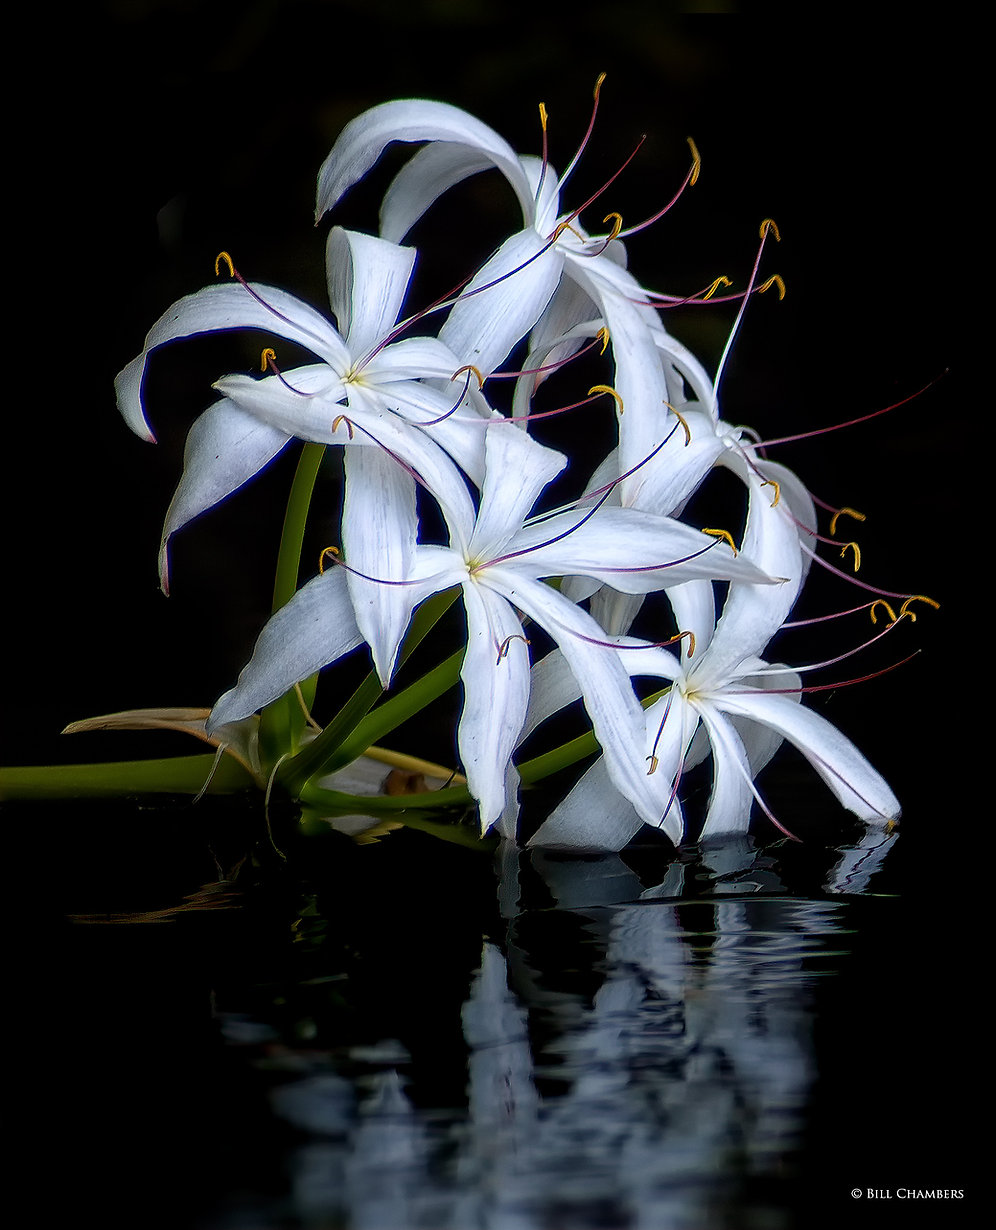 F59a- - Swamp Lily - NIK - 2000.jpg